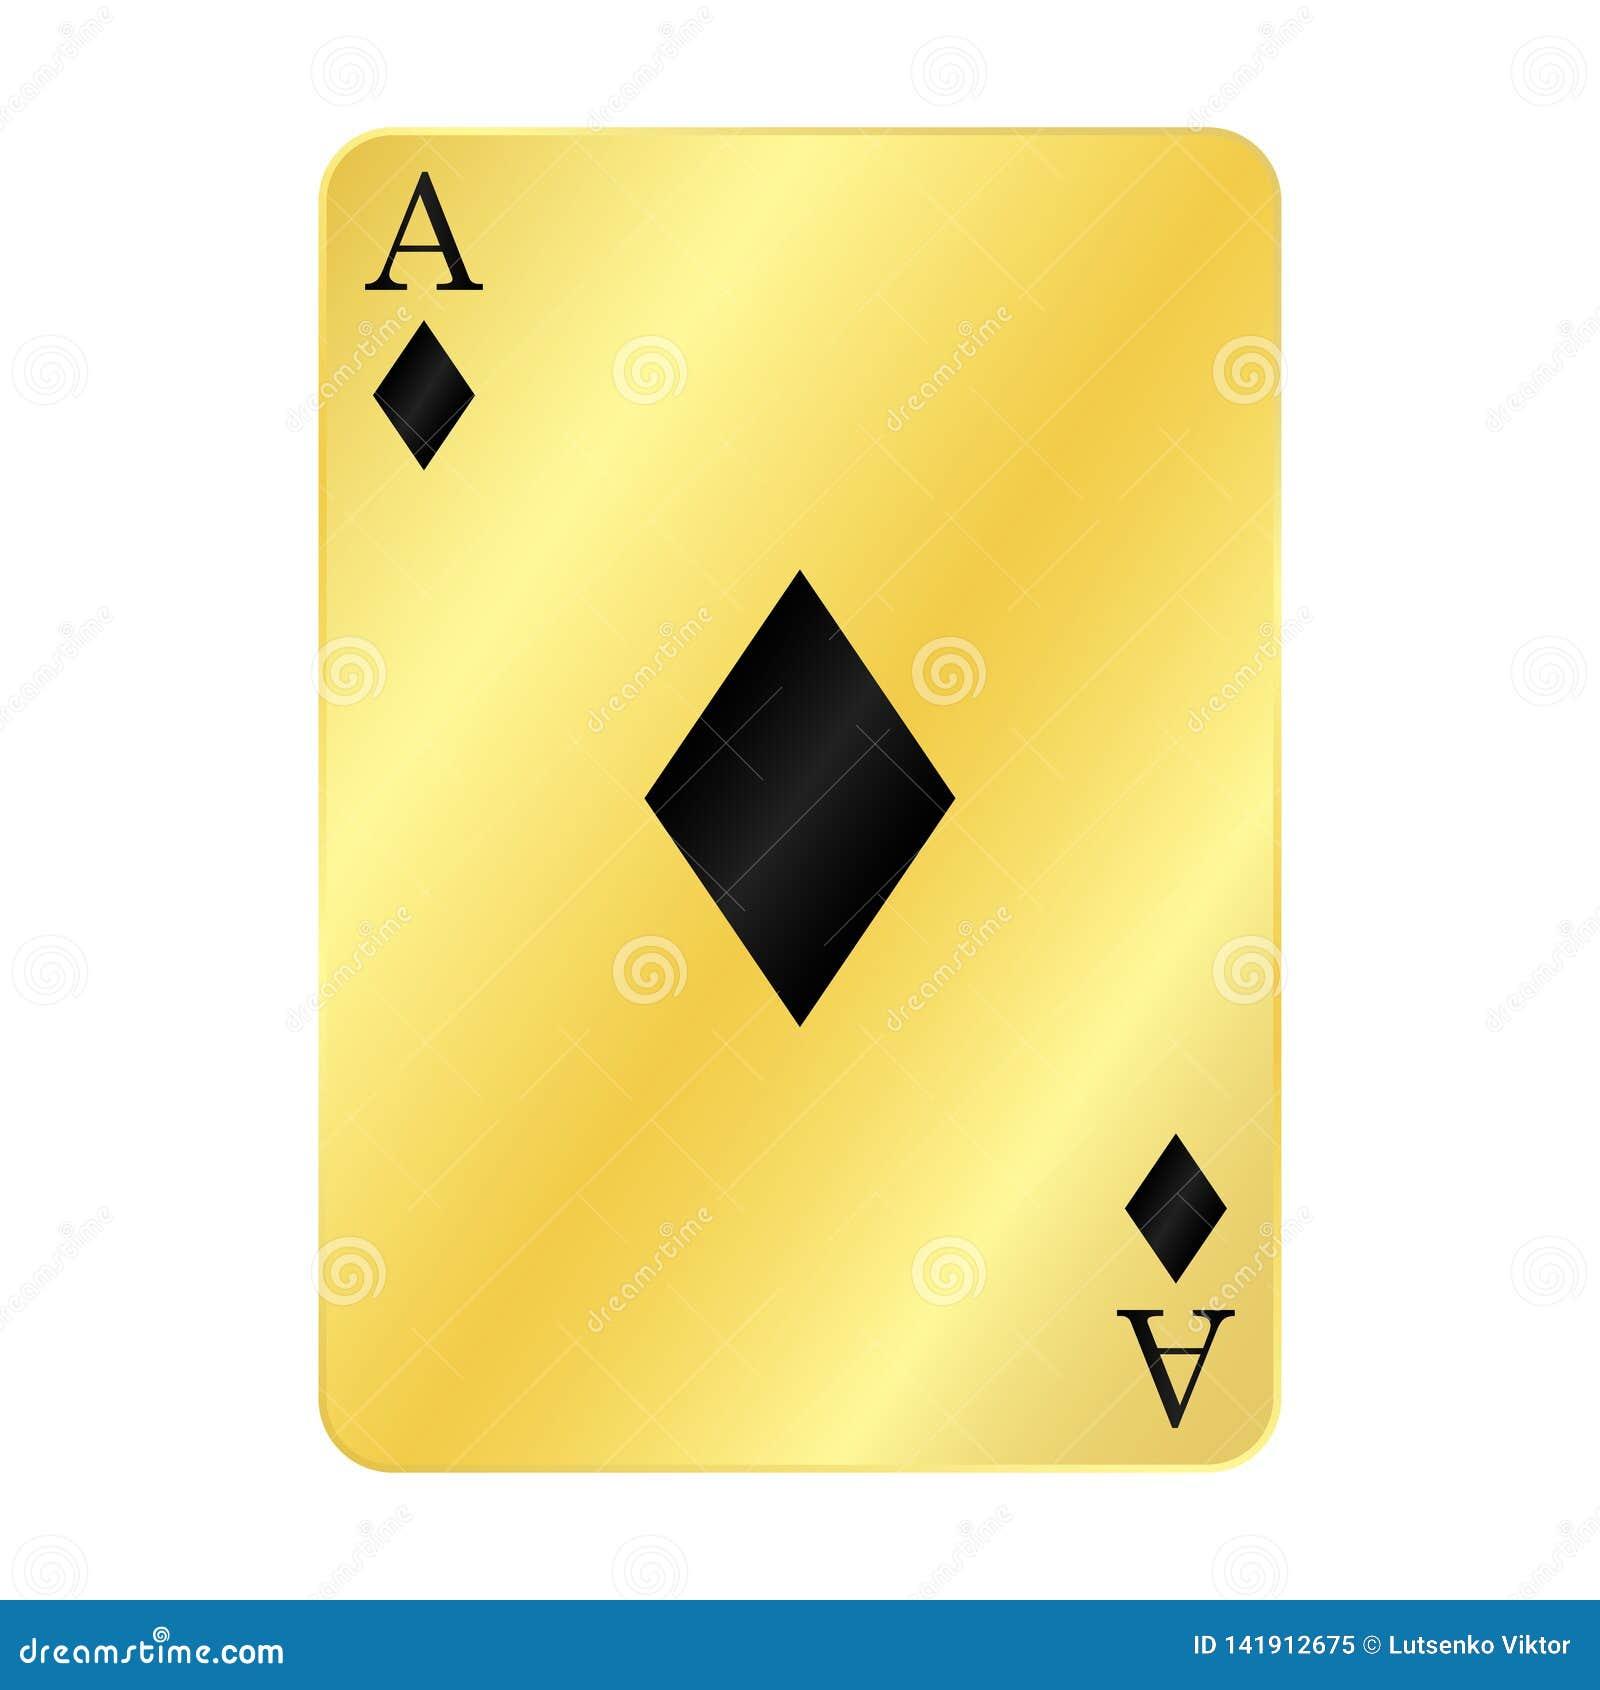 Fun gold ace of diamonds